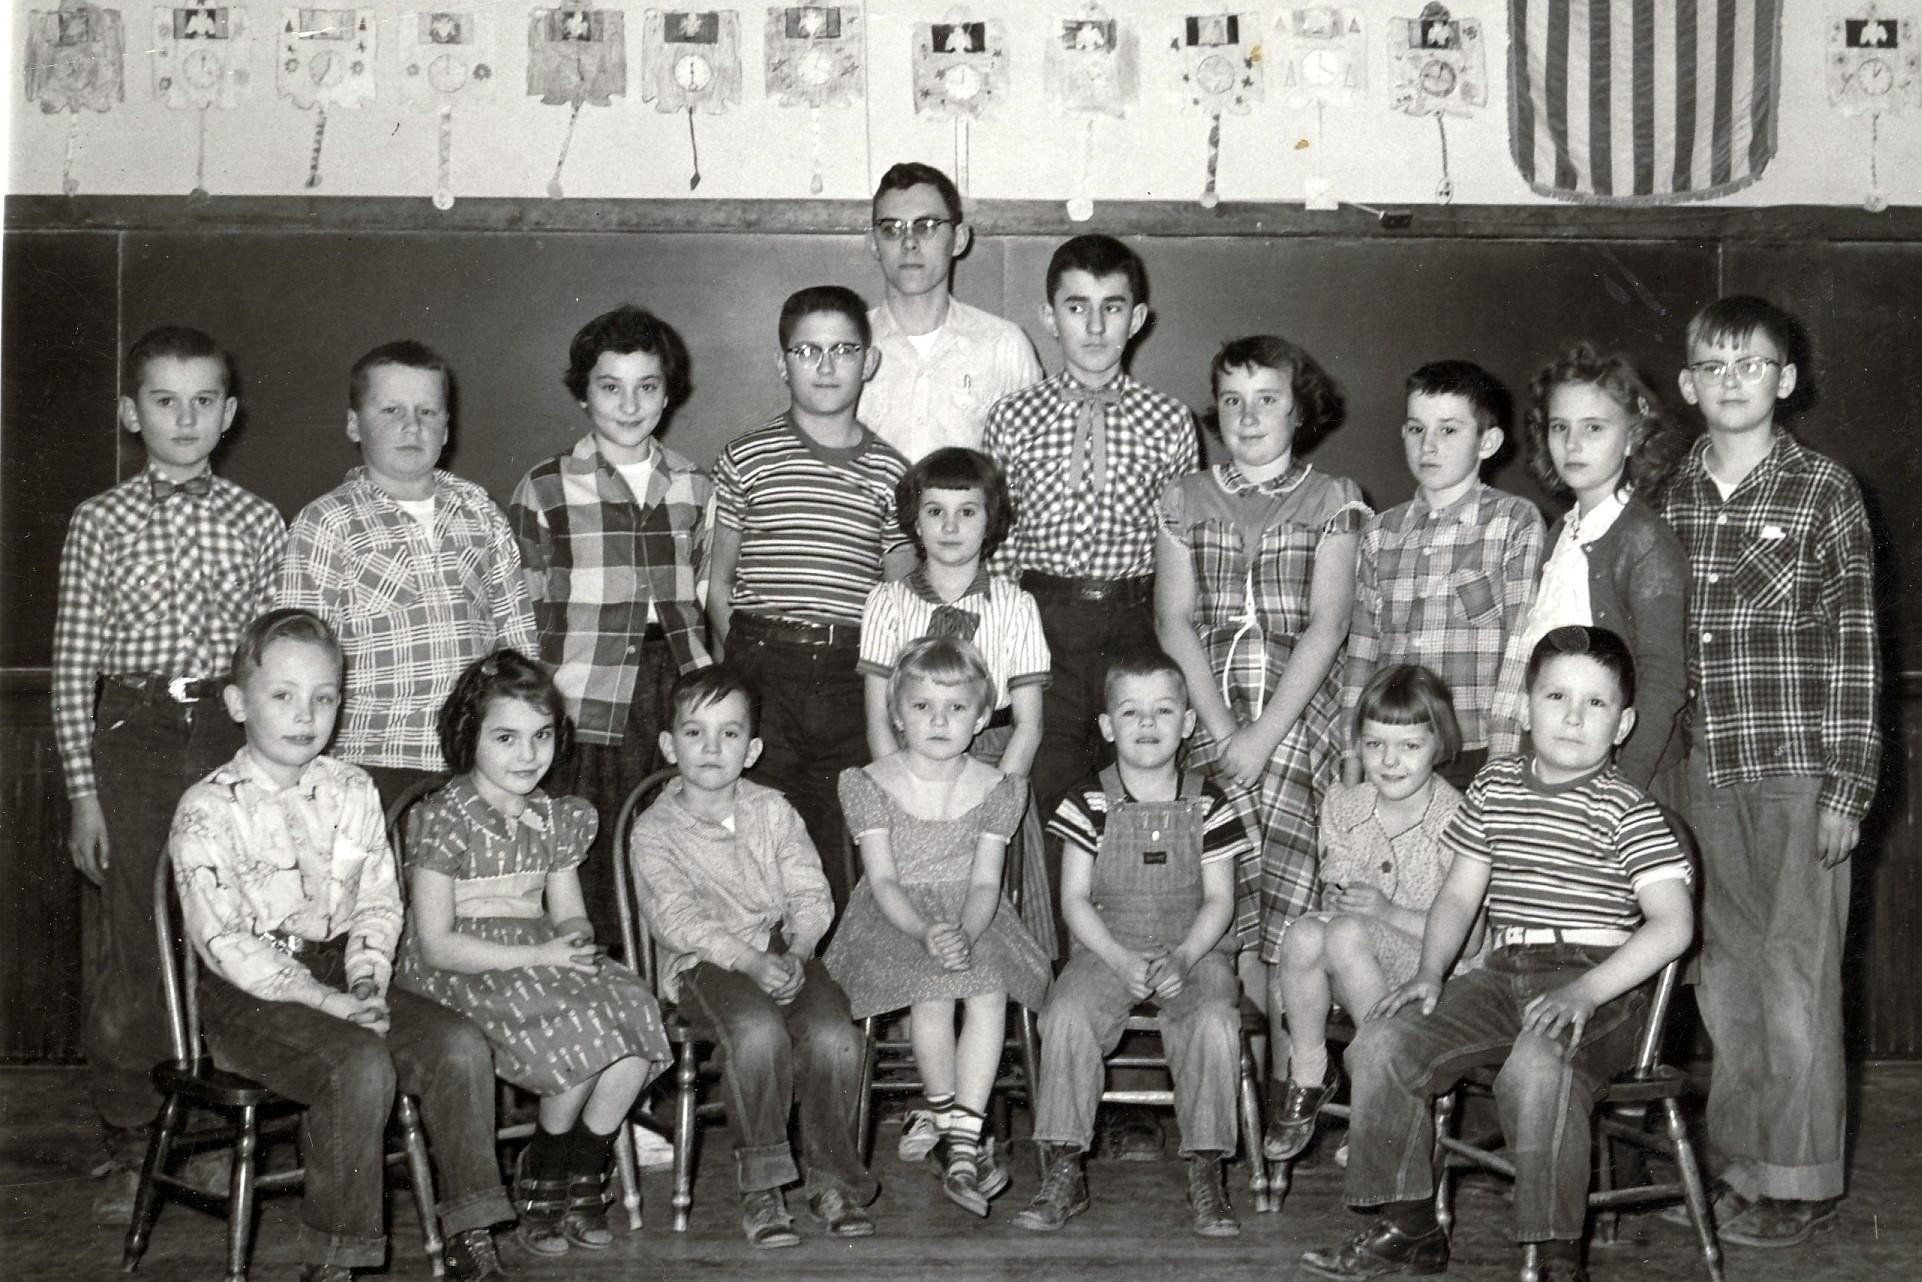 District 21 1957